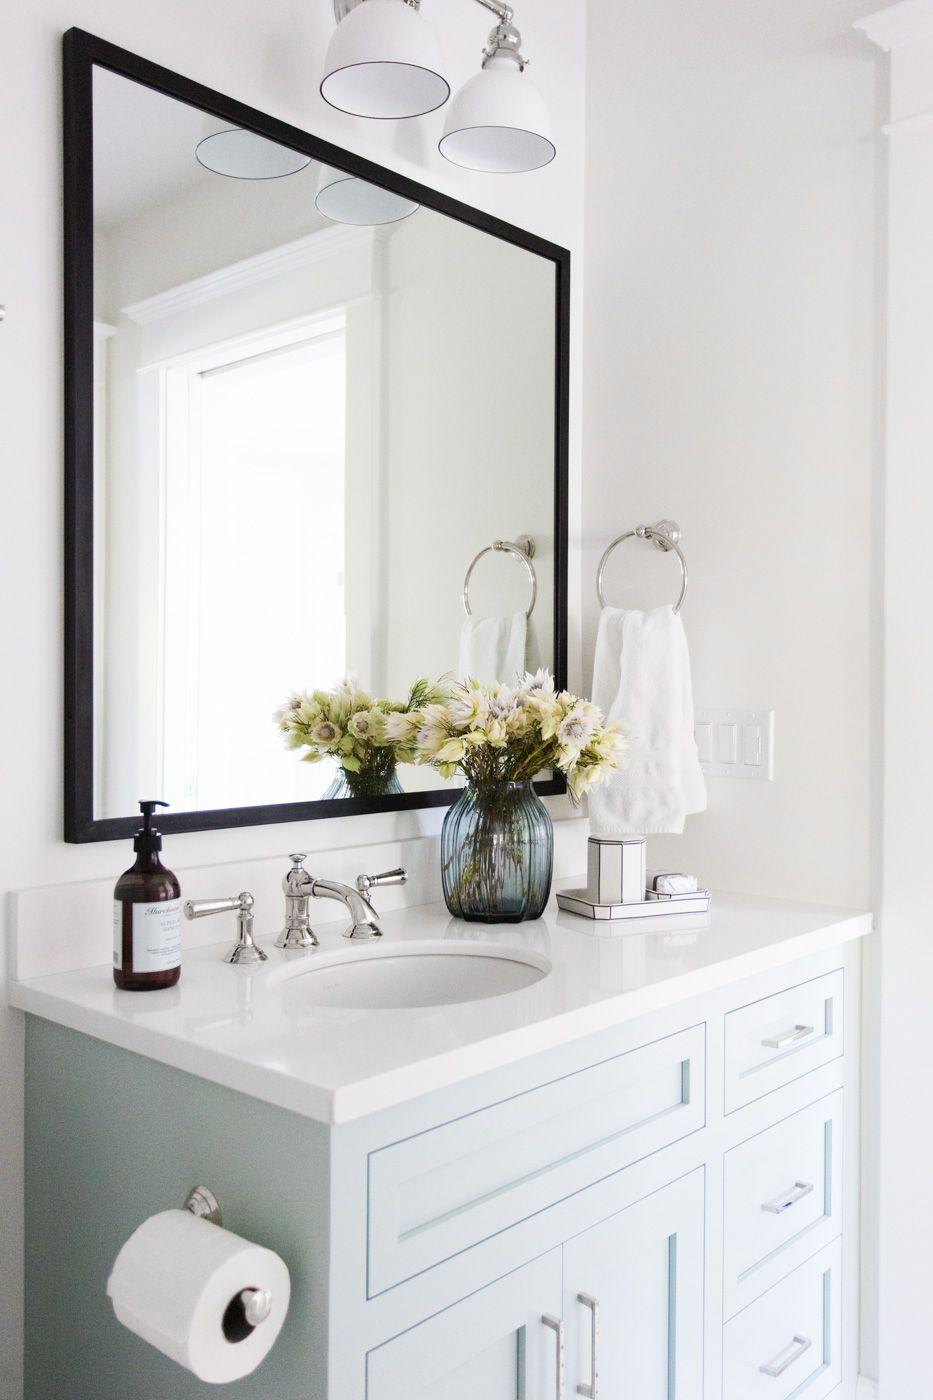 Bathroom Design Inspiration astonishing inspiration for bathrooms Bathroom Inspiration White Blue Traditional